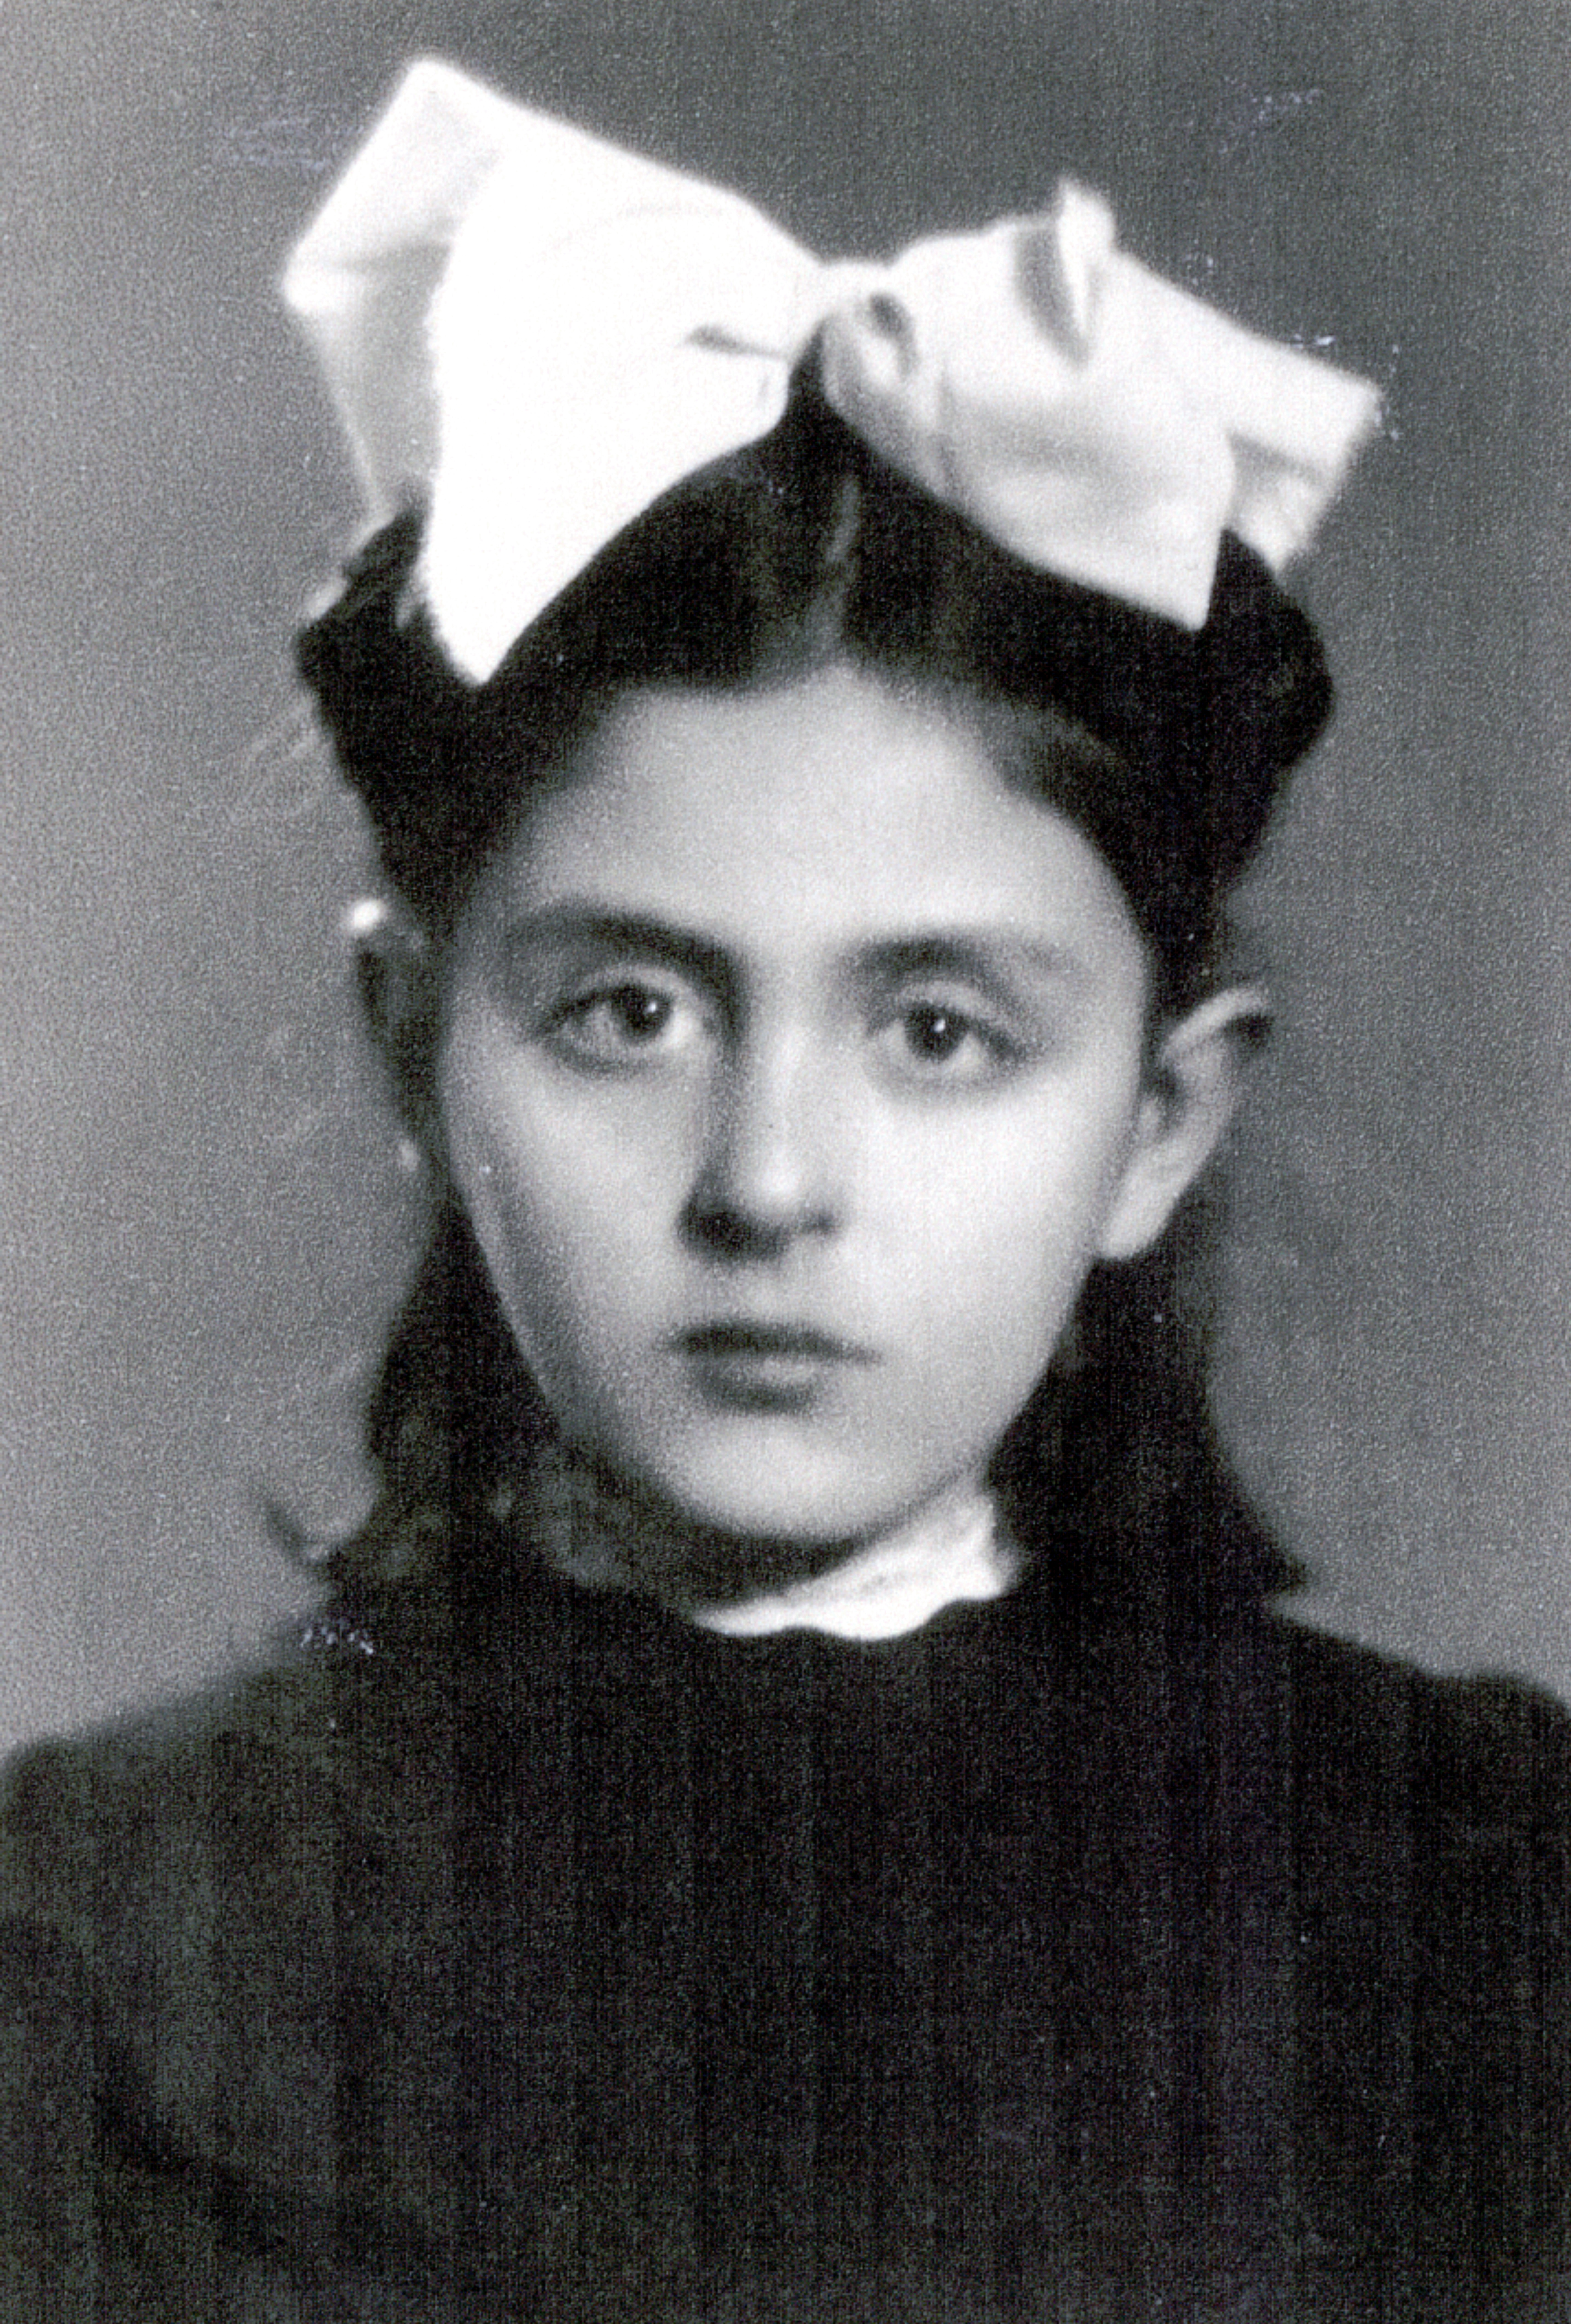 Dora Nisman's daughter Maria Krupievskaya